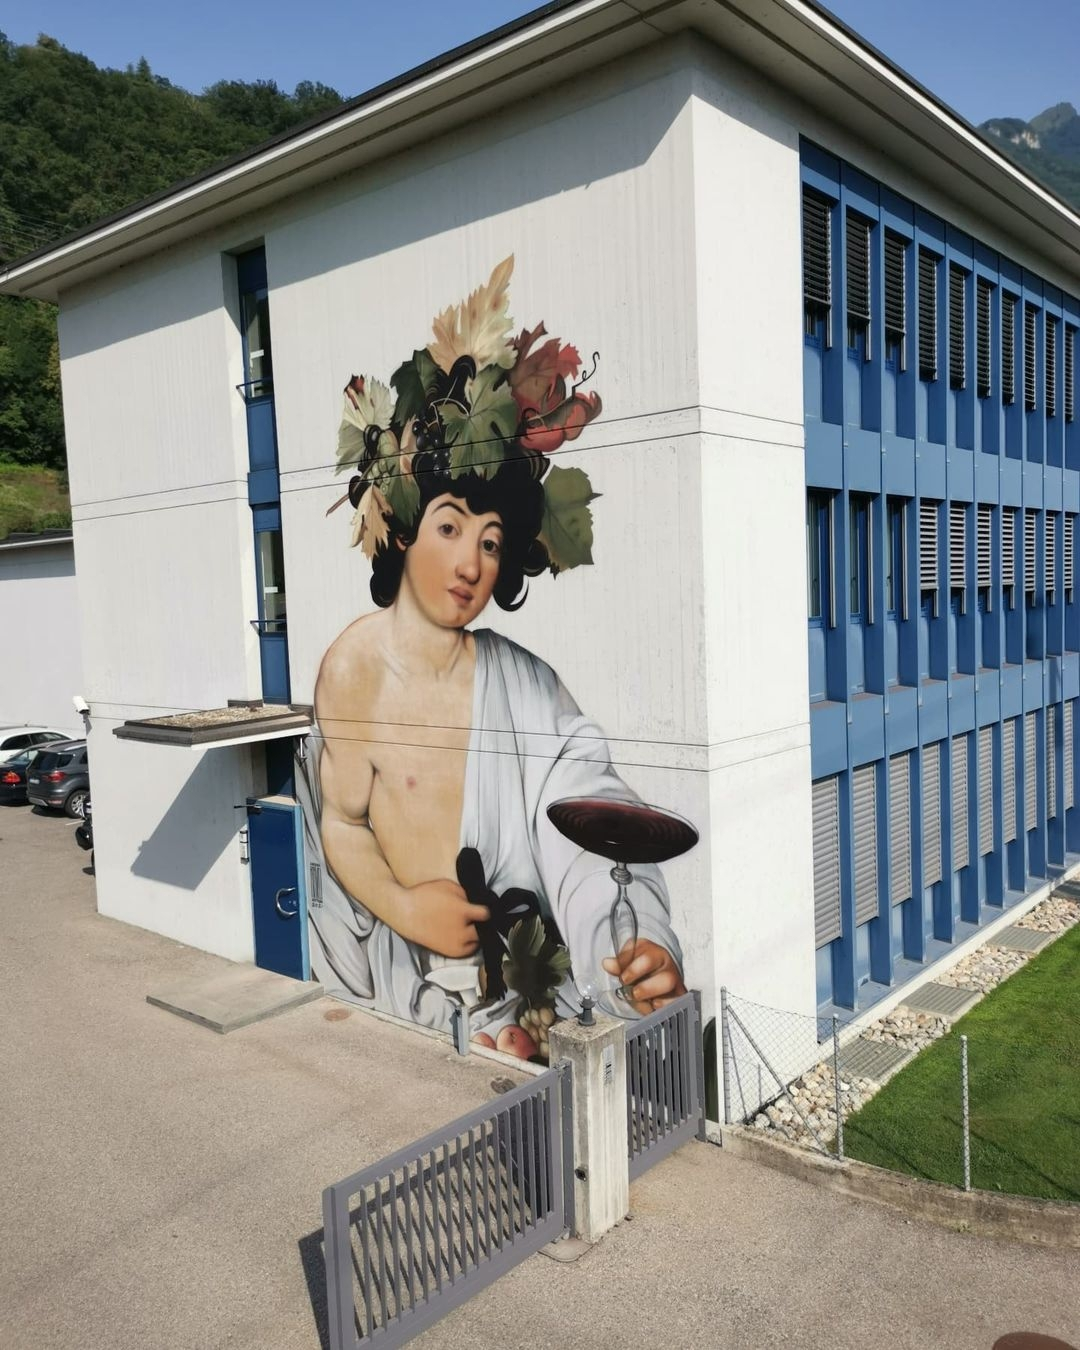 Andrea Ravo Mattoni @ Melano, Switzerland